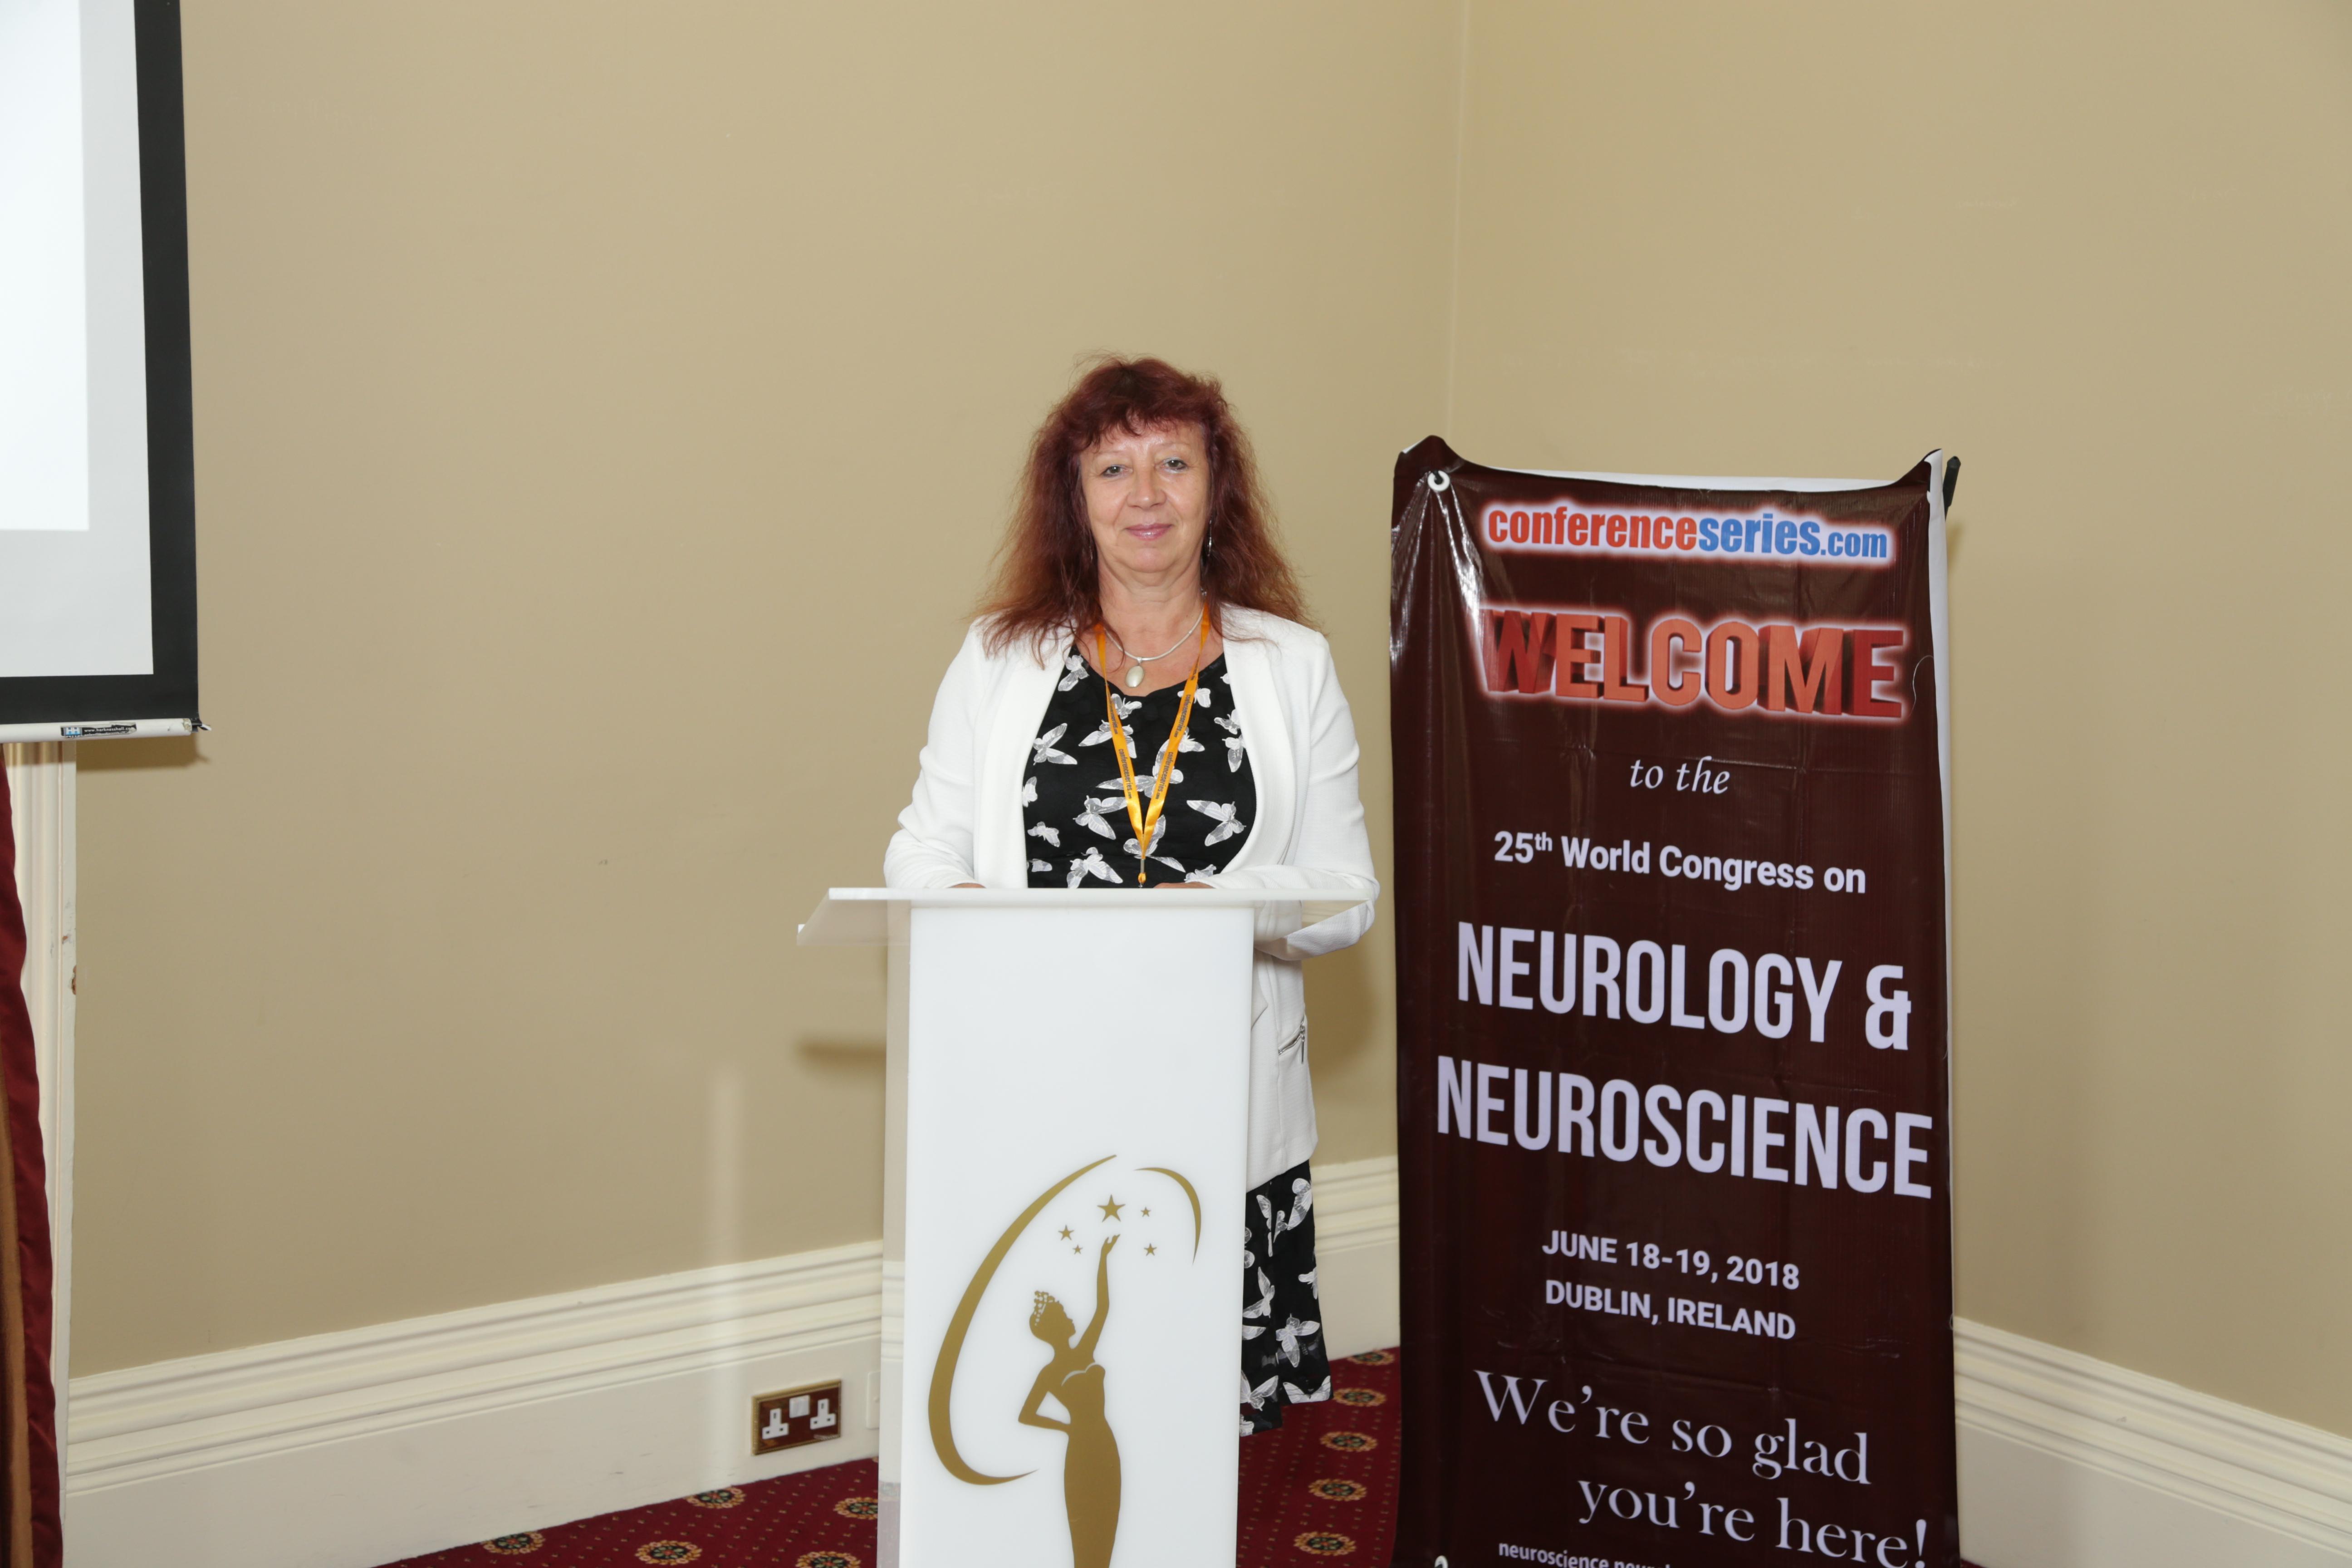 Neuroscience Congress 2019 International Conference Keynote Speaker Gabriele Saretzki photo